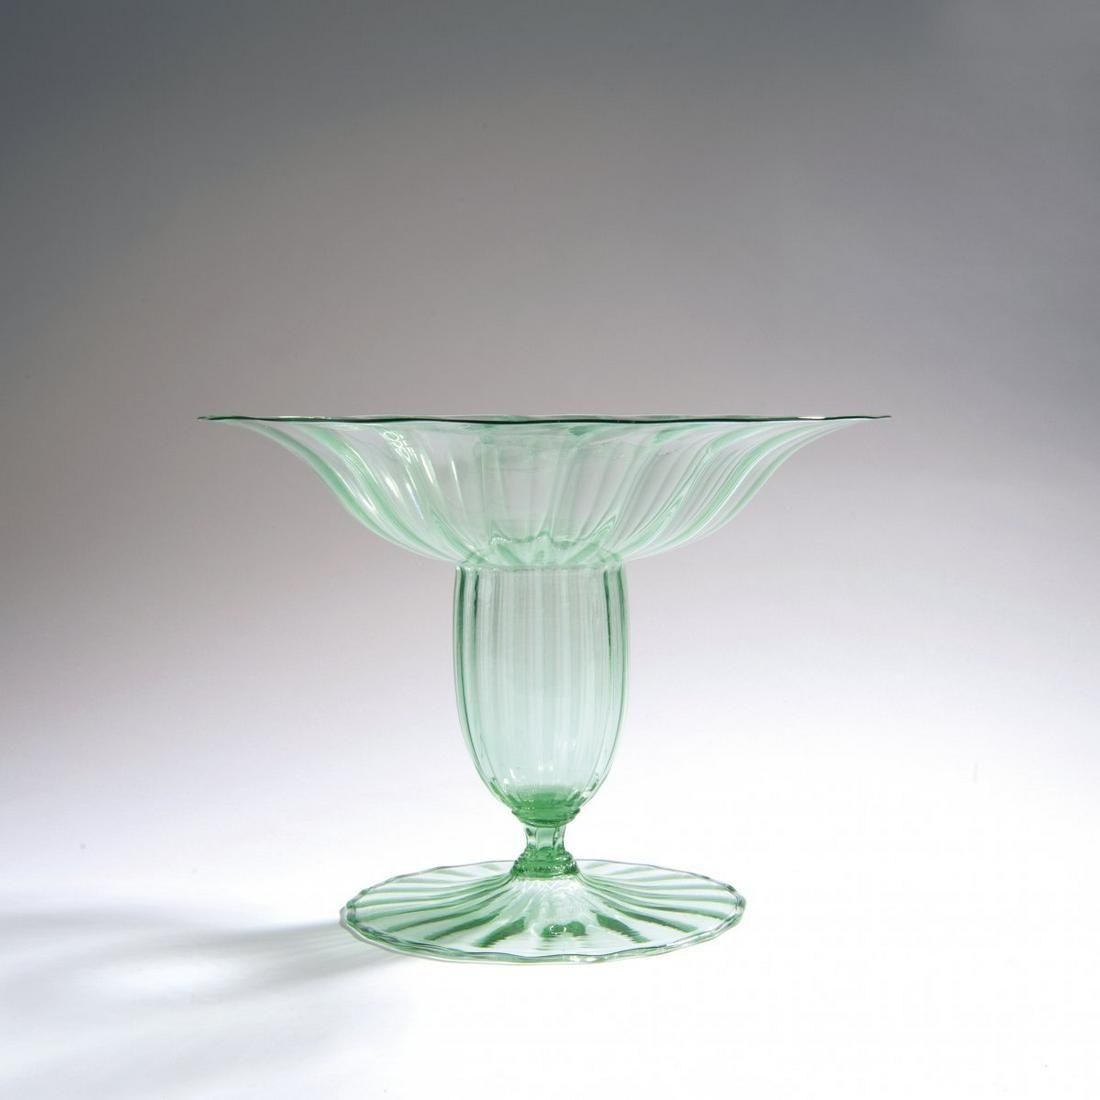 Napoleone Martinuzzi, 'Trasparente' vase, c. 1927